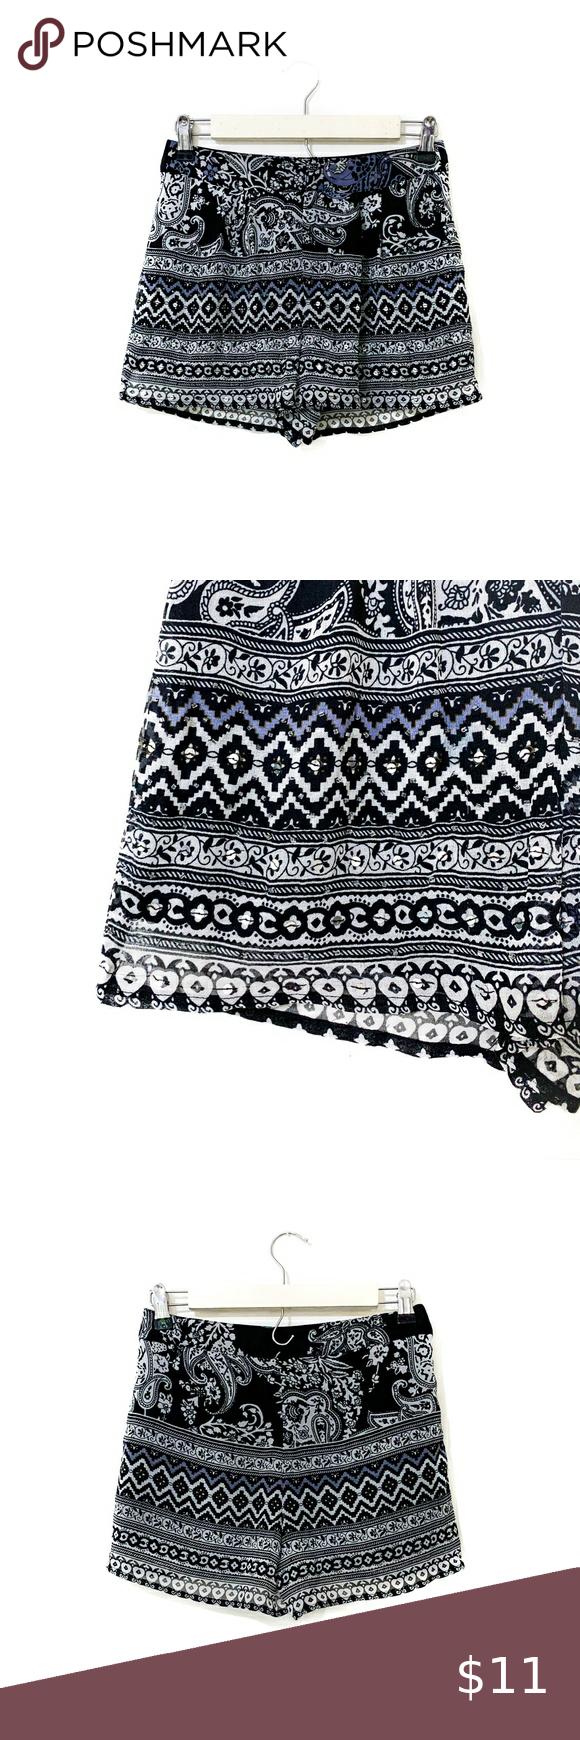 Paisley Beaded Chiffon Shorts XS Paisley print beaded chiffon shorts | Excellent condition, no beads or sequins missing | Size X-Small (XS) Patrons of Peace Shorts